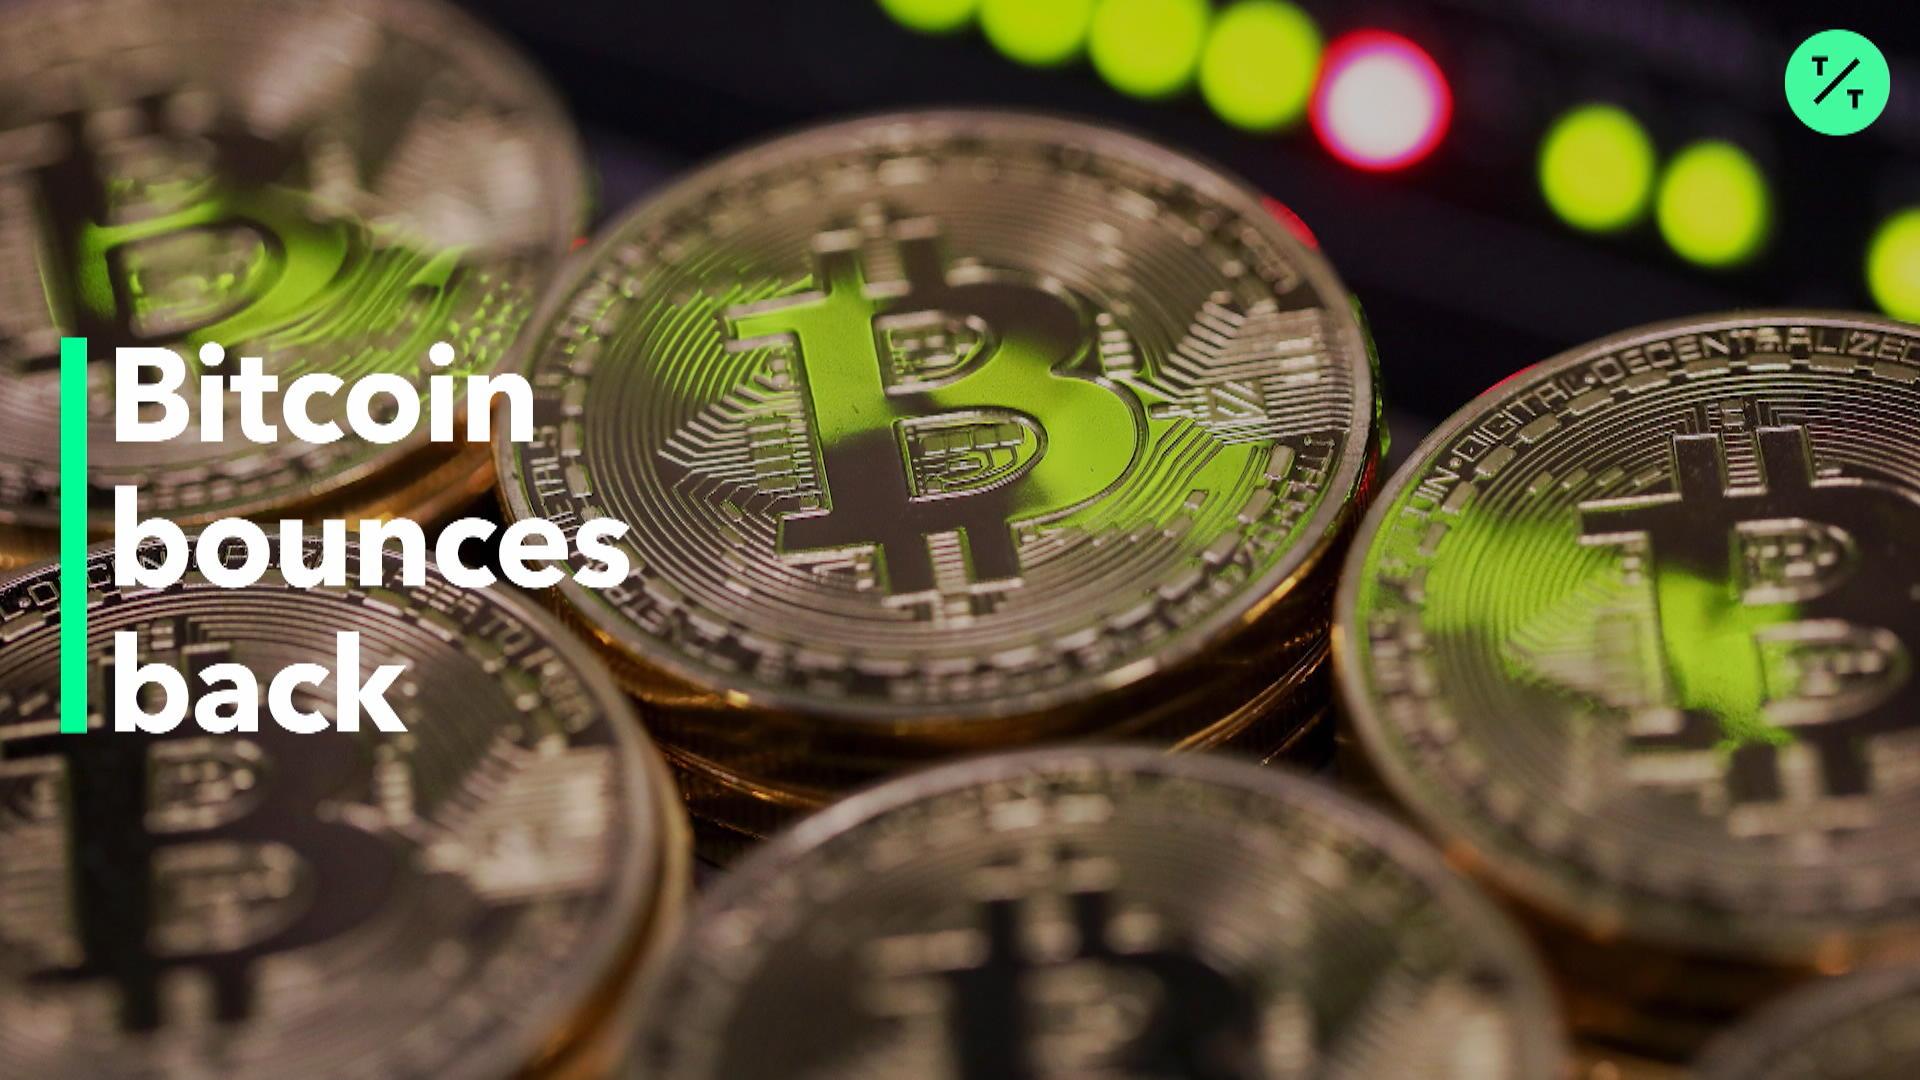 Bitcoin Surpasses $11,000